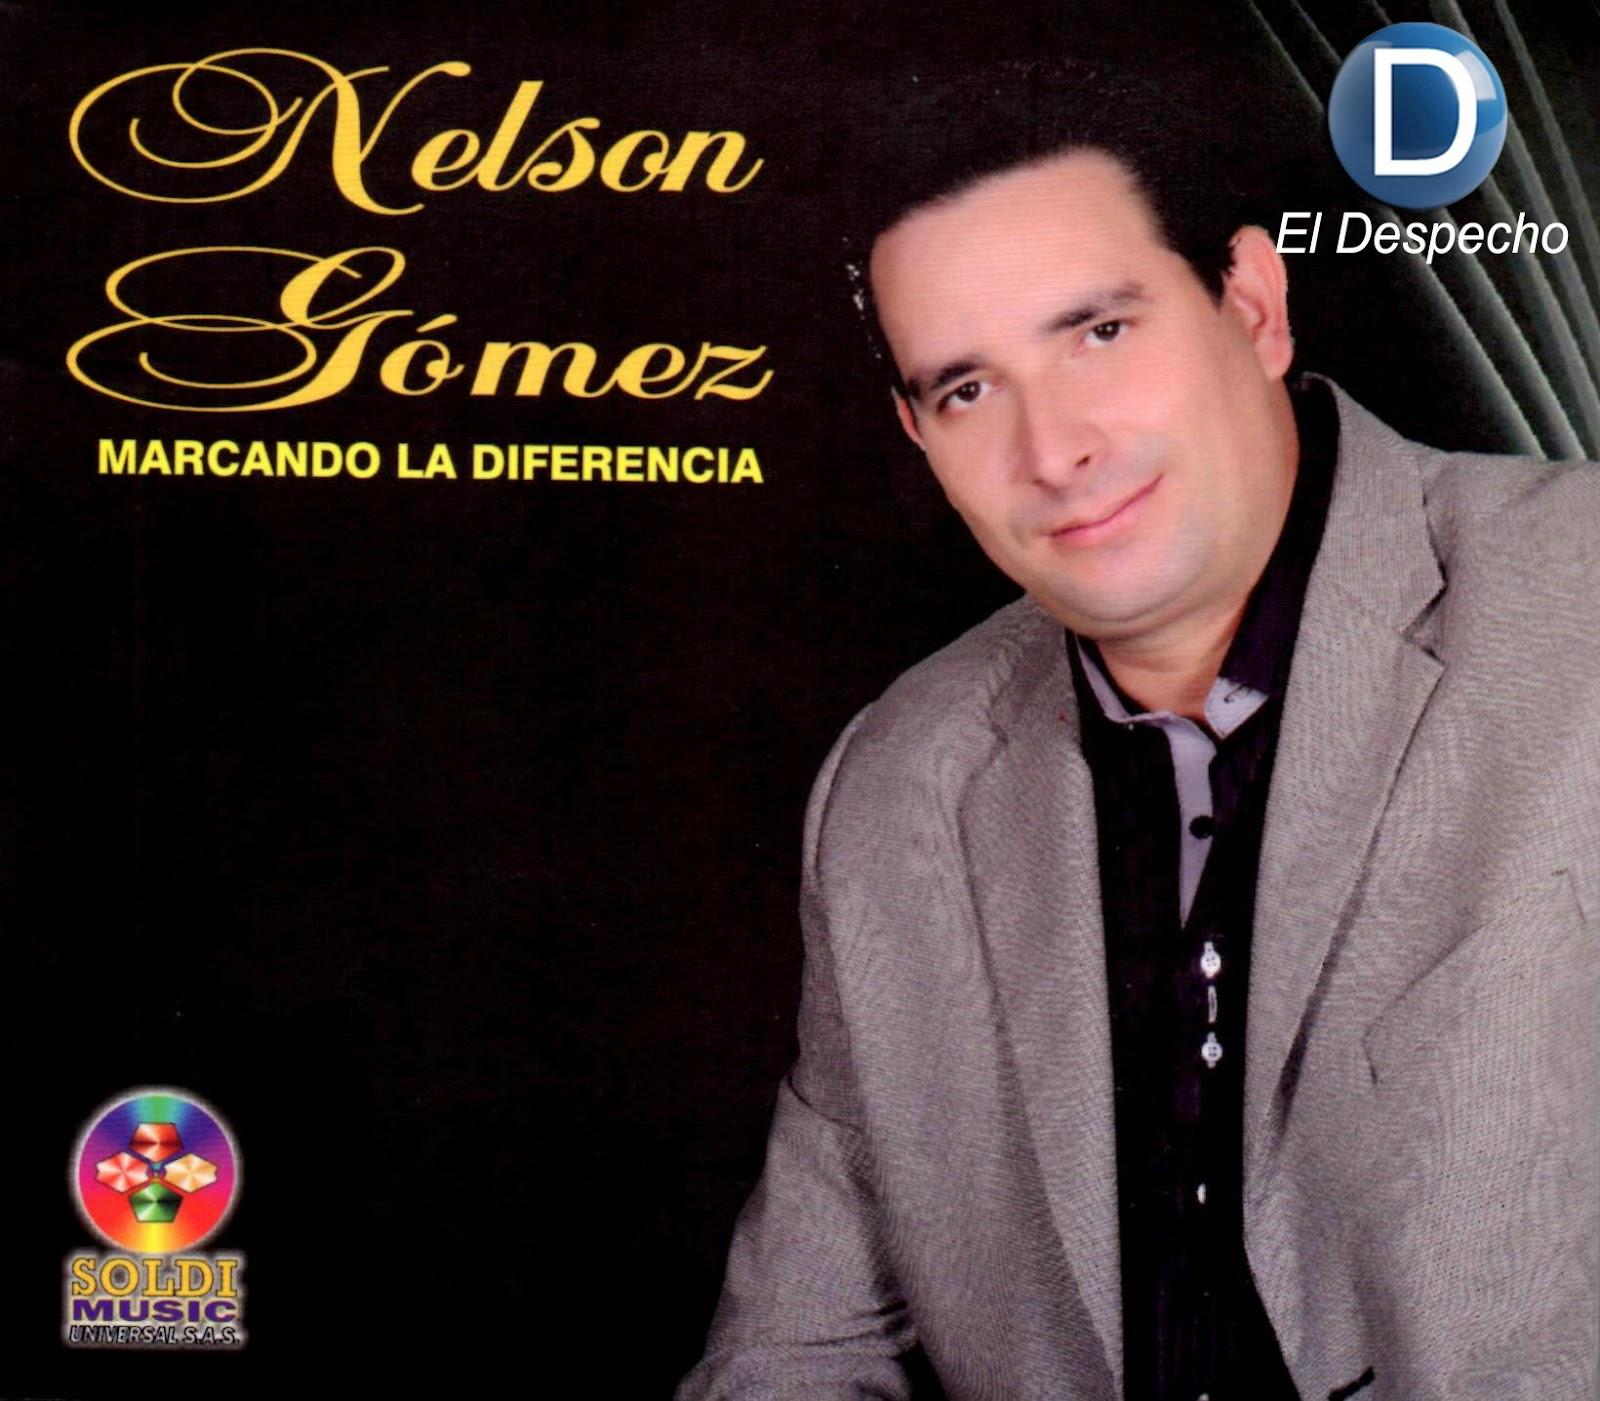 Nelson Gomez